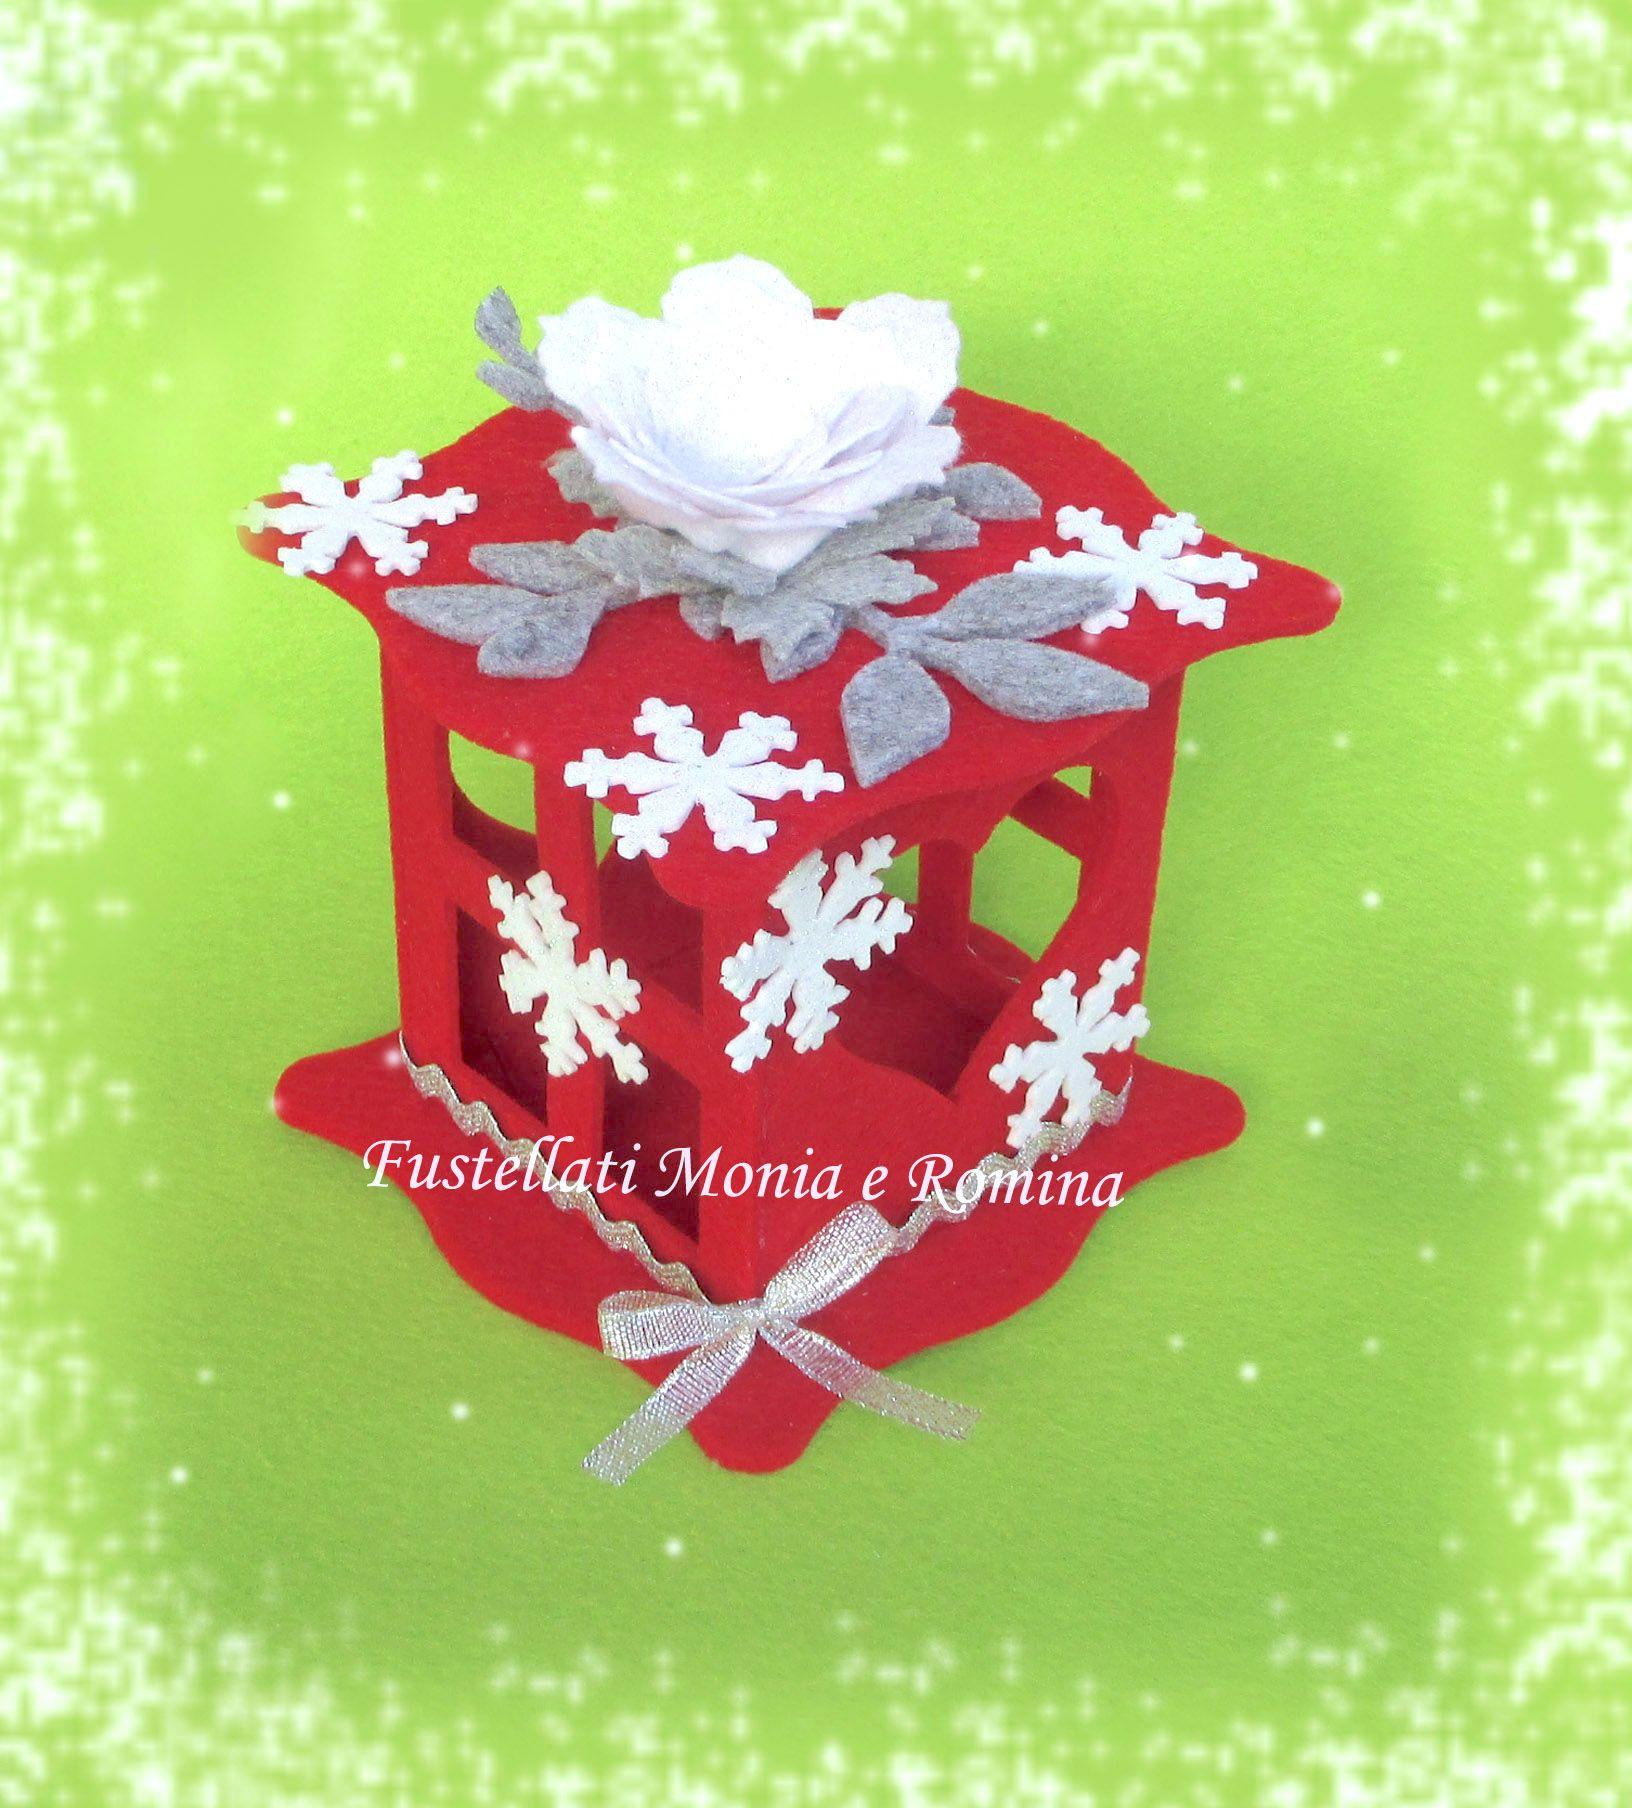 Fustellati Sagoma Lanterna Natale Feltro 3d Kit Fai Da Te